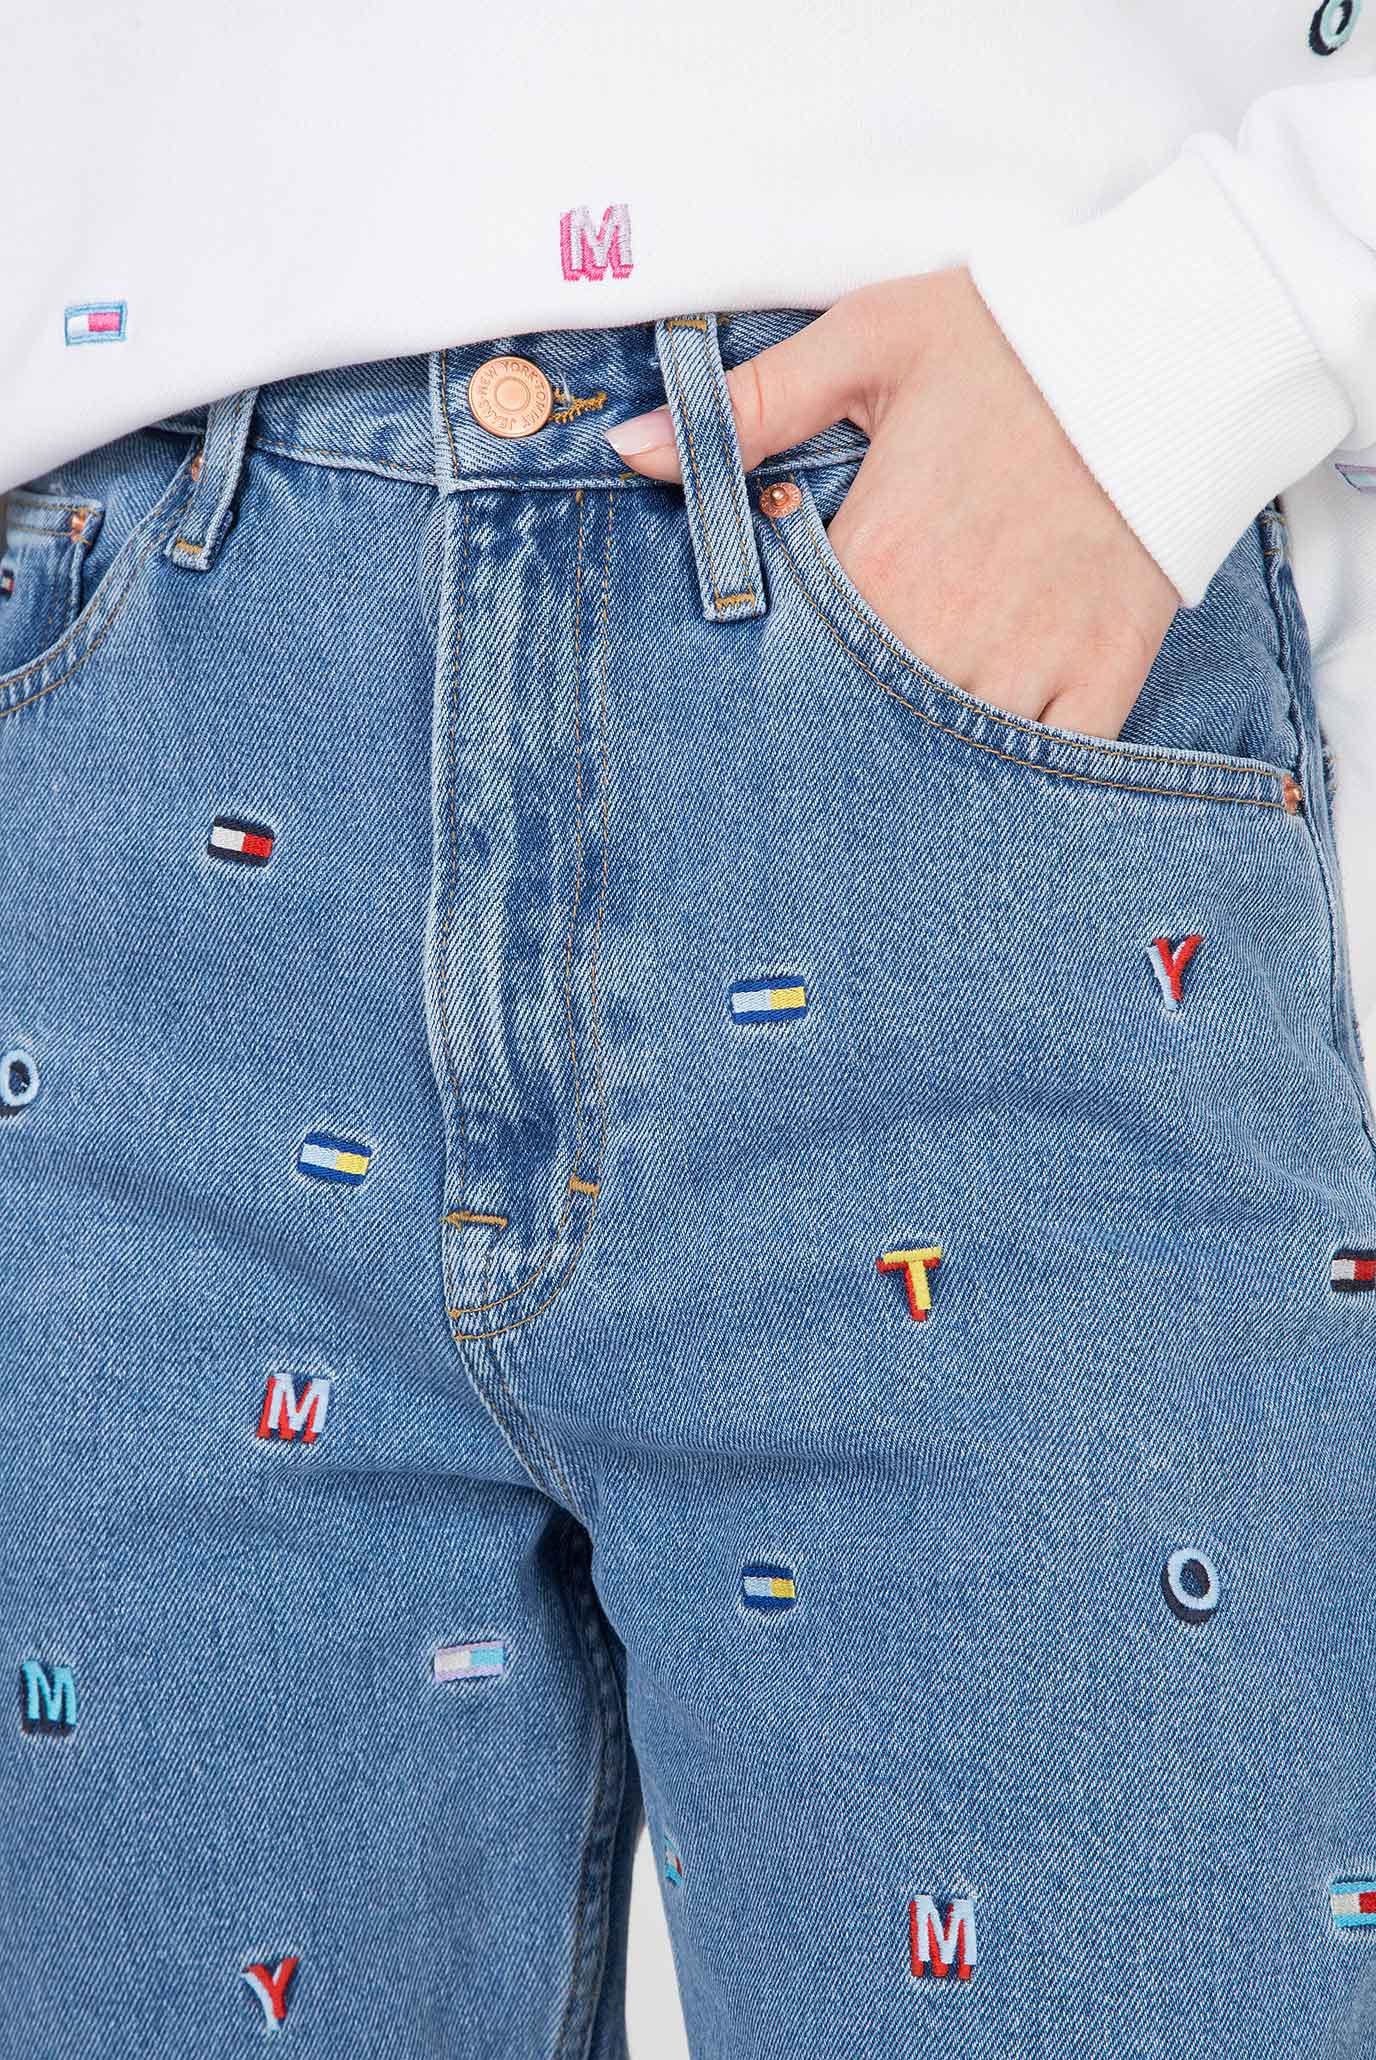 Купить Женские голубые джинсы HIGH RISE TAPERED TJ 2004  GRTLB Tommy Hilfiger Tommy Hilfiger DW0DW06429 – Киев, Украина. Цены в интернет магазине MD Fashion